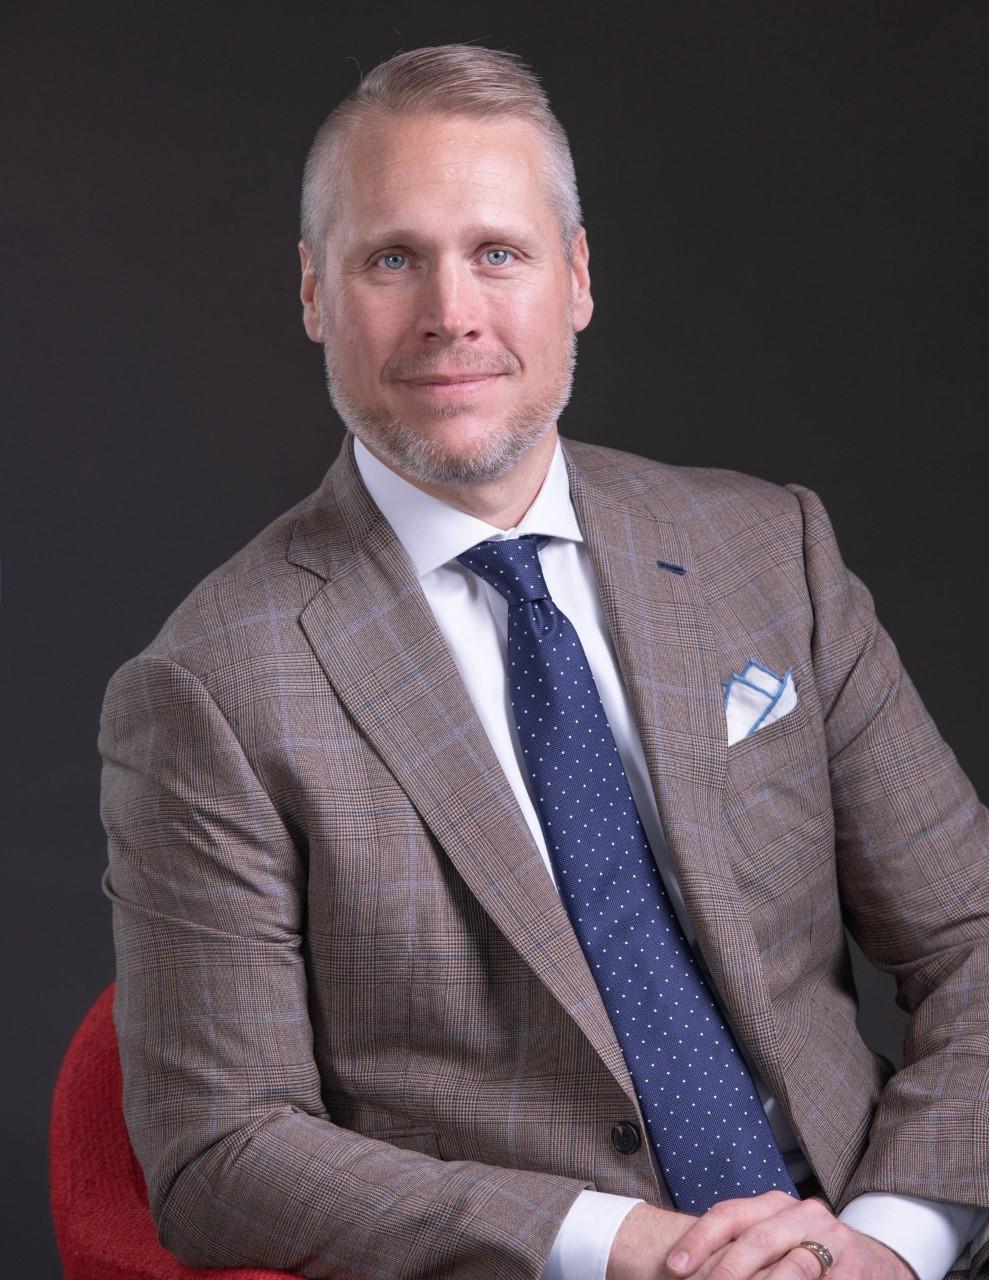 Portrait image of the founder Tim Bonnell Jr.